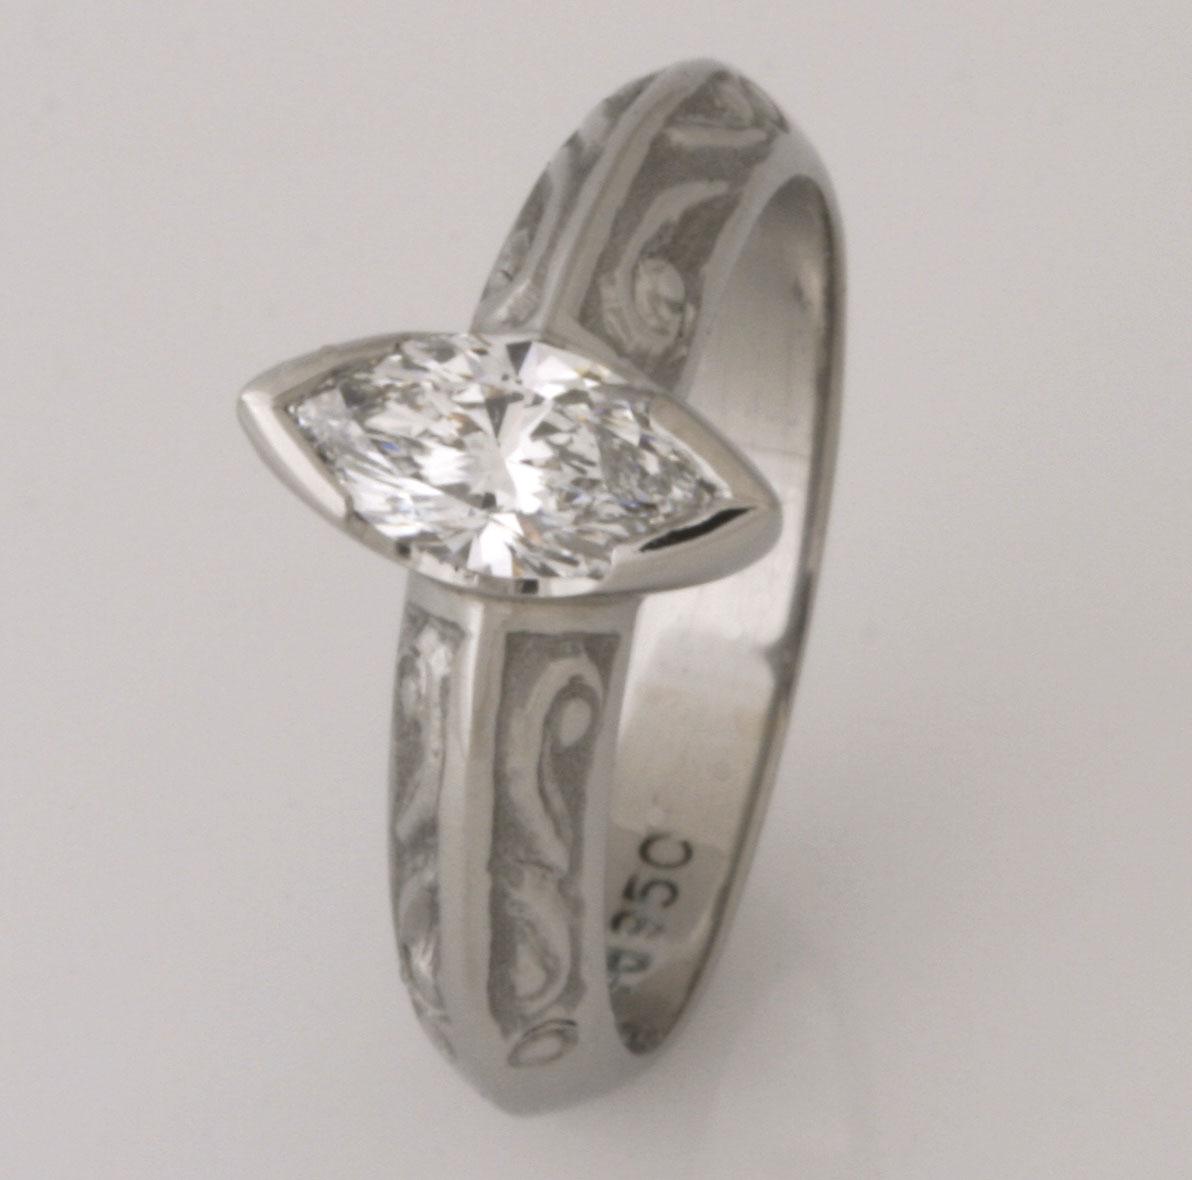 Handmade ladies palladium marquise cut diamond ring